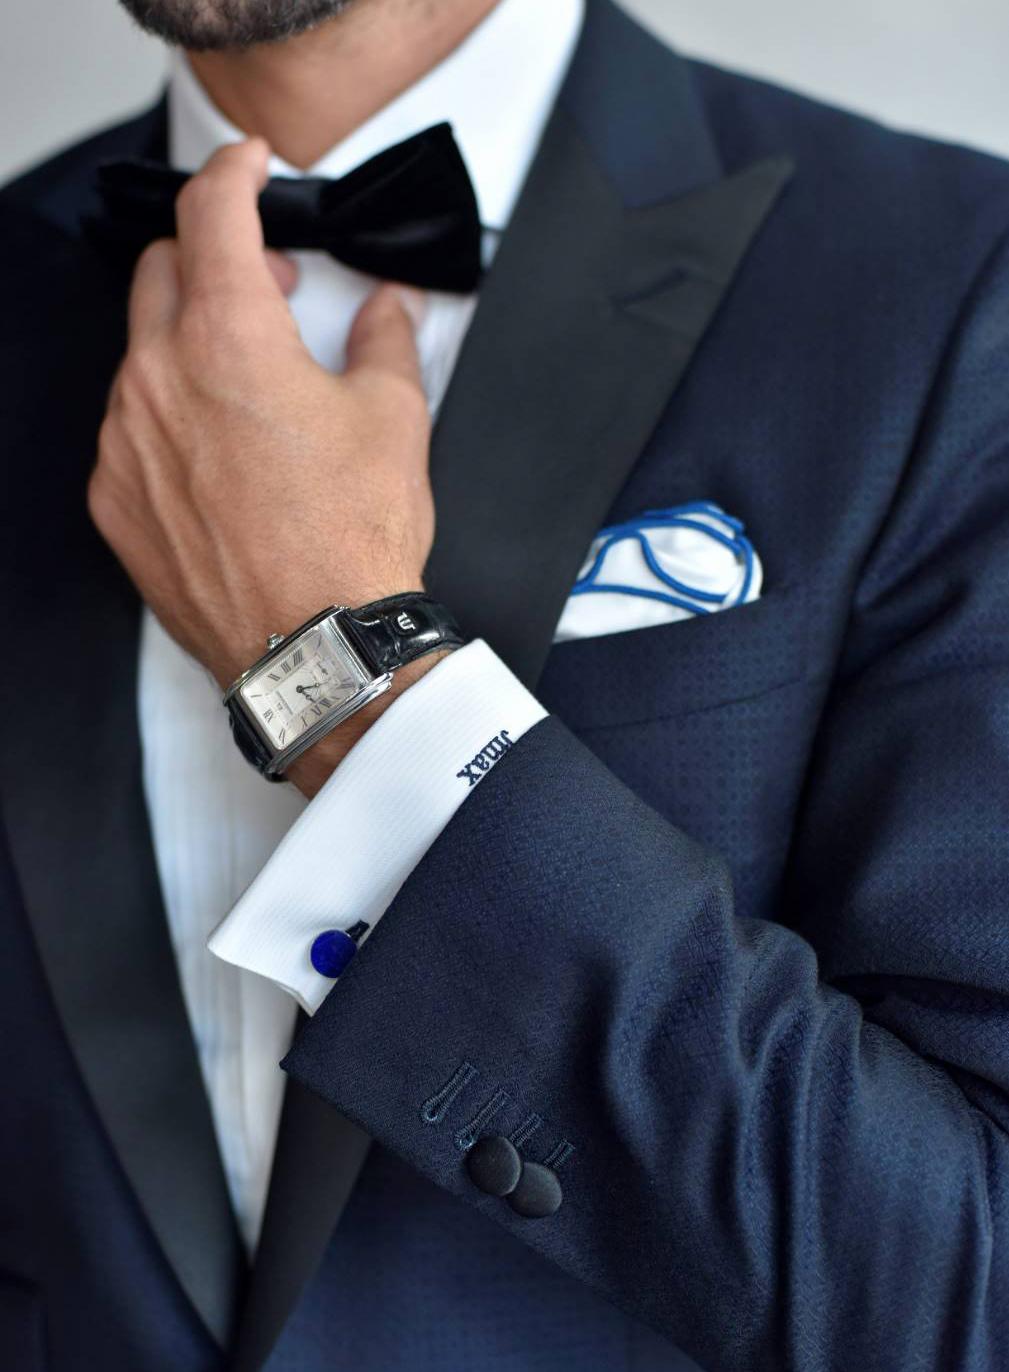 wearing dress watch with midnight blue tuxedo